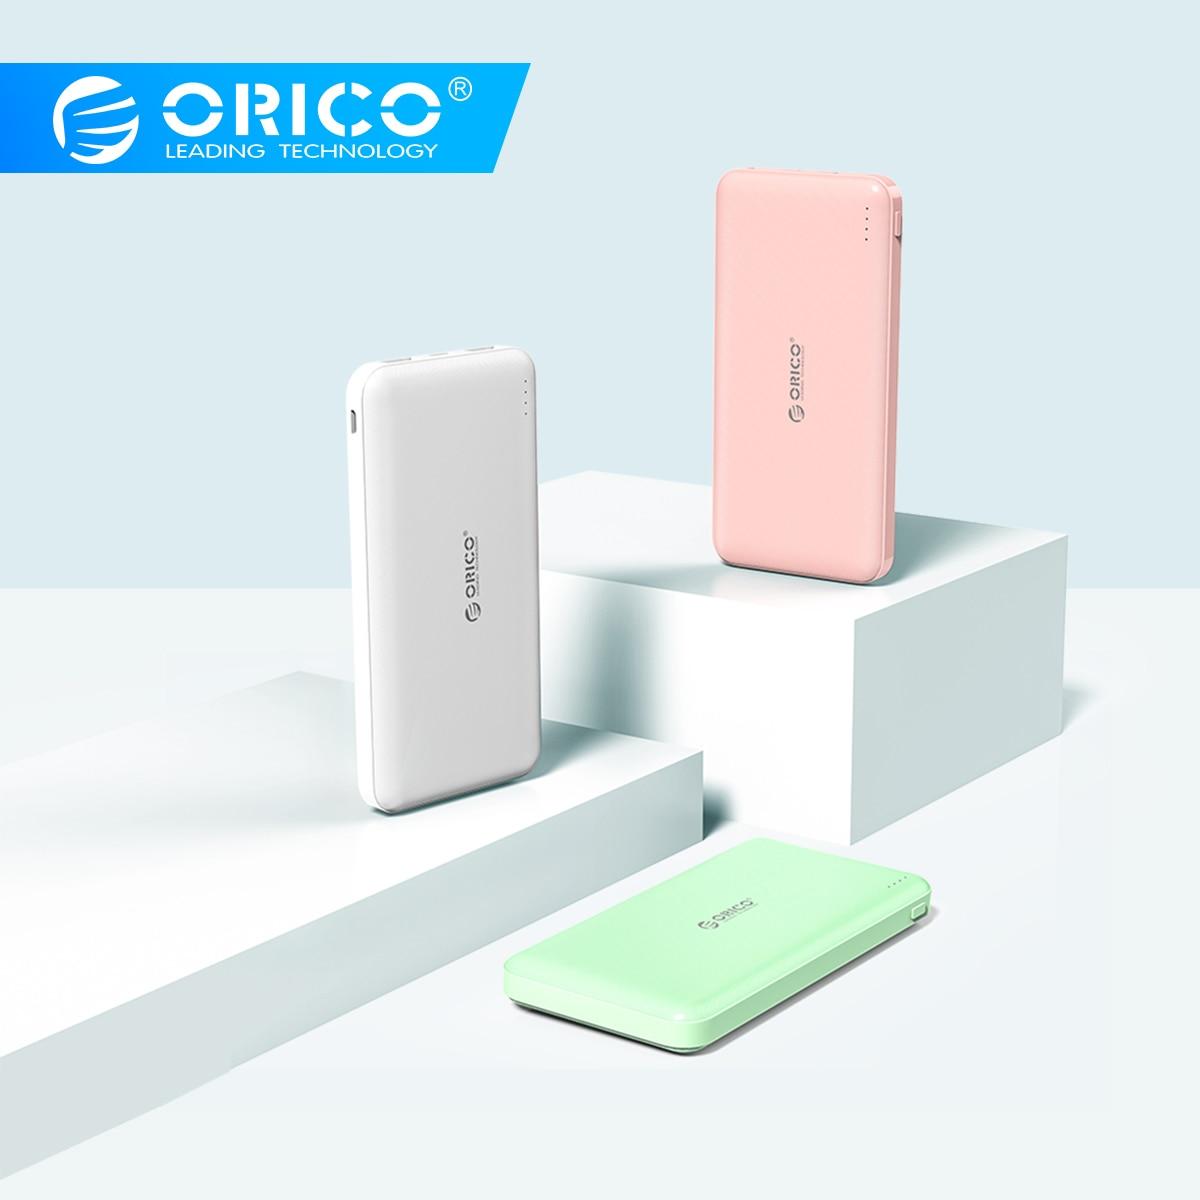 ORICO 10000 мА/ч внешний аккумулятор для путешествий, тонкий внешний аккумулятор usb type C, внешний аккумулятор для телефона, портативное зарядное у...